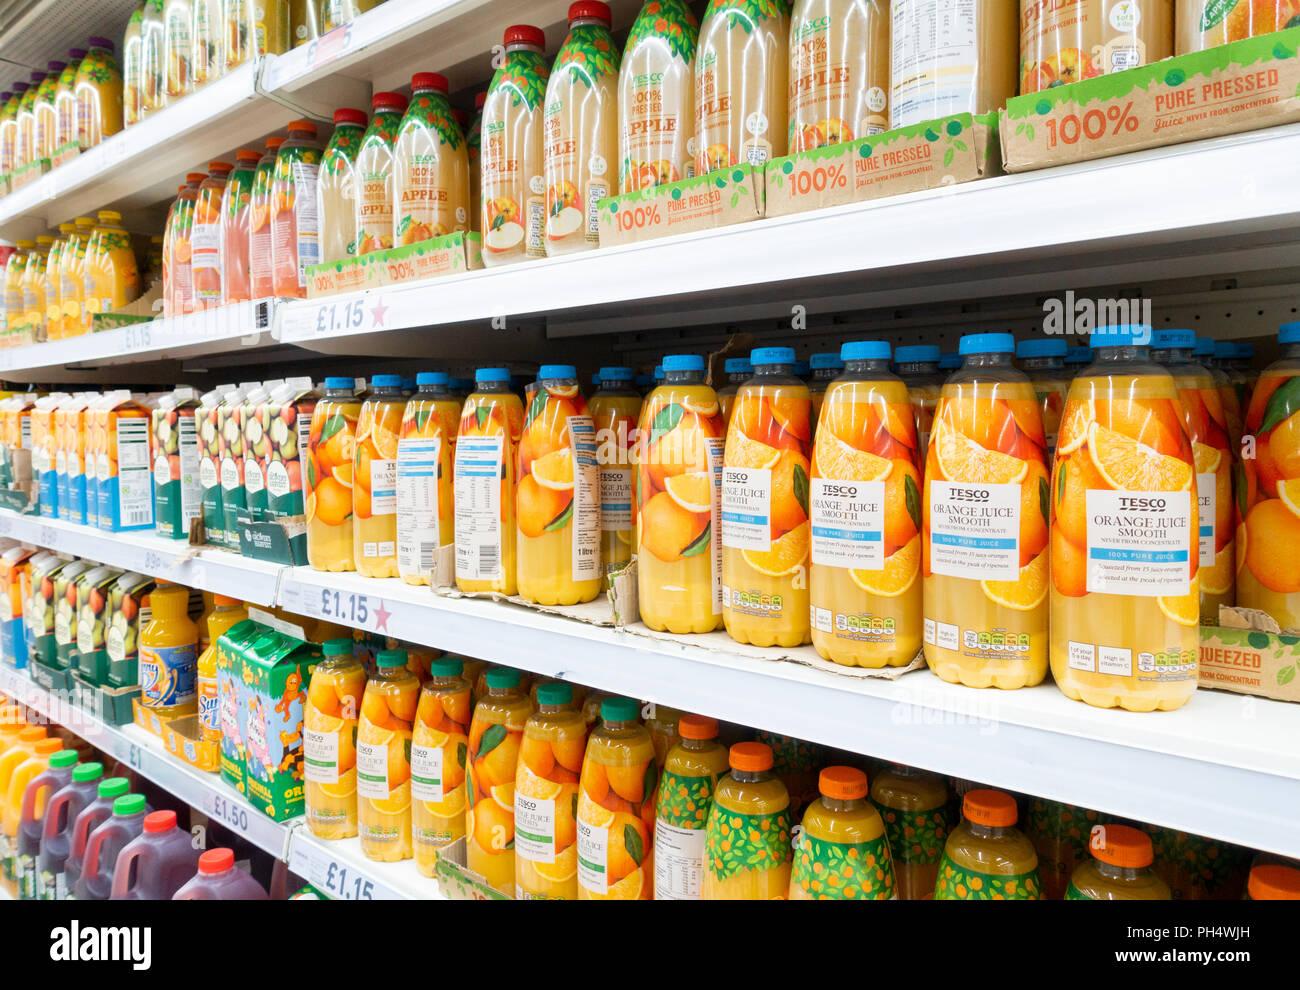 Tesco 100% fresh Orange juice in Tesco supermarket. UK Stock Photo - Alamy